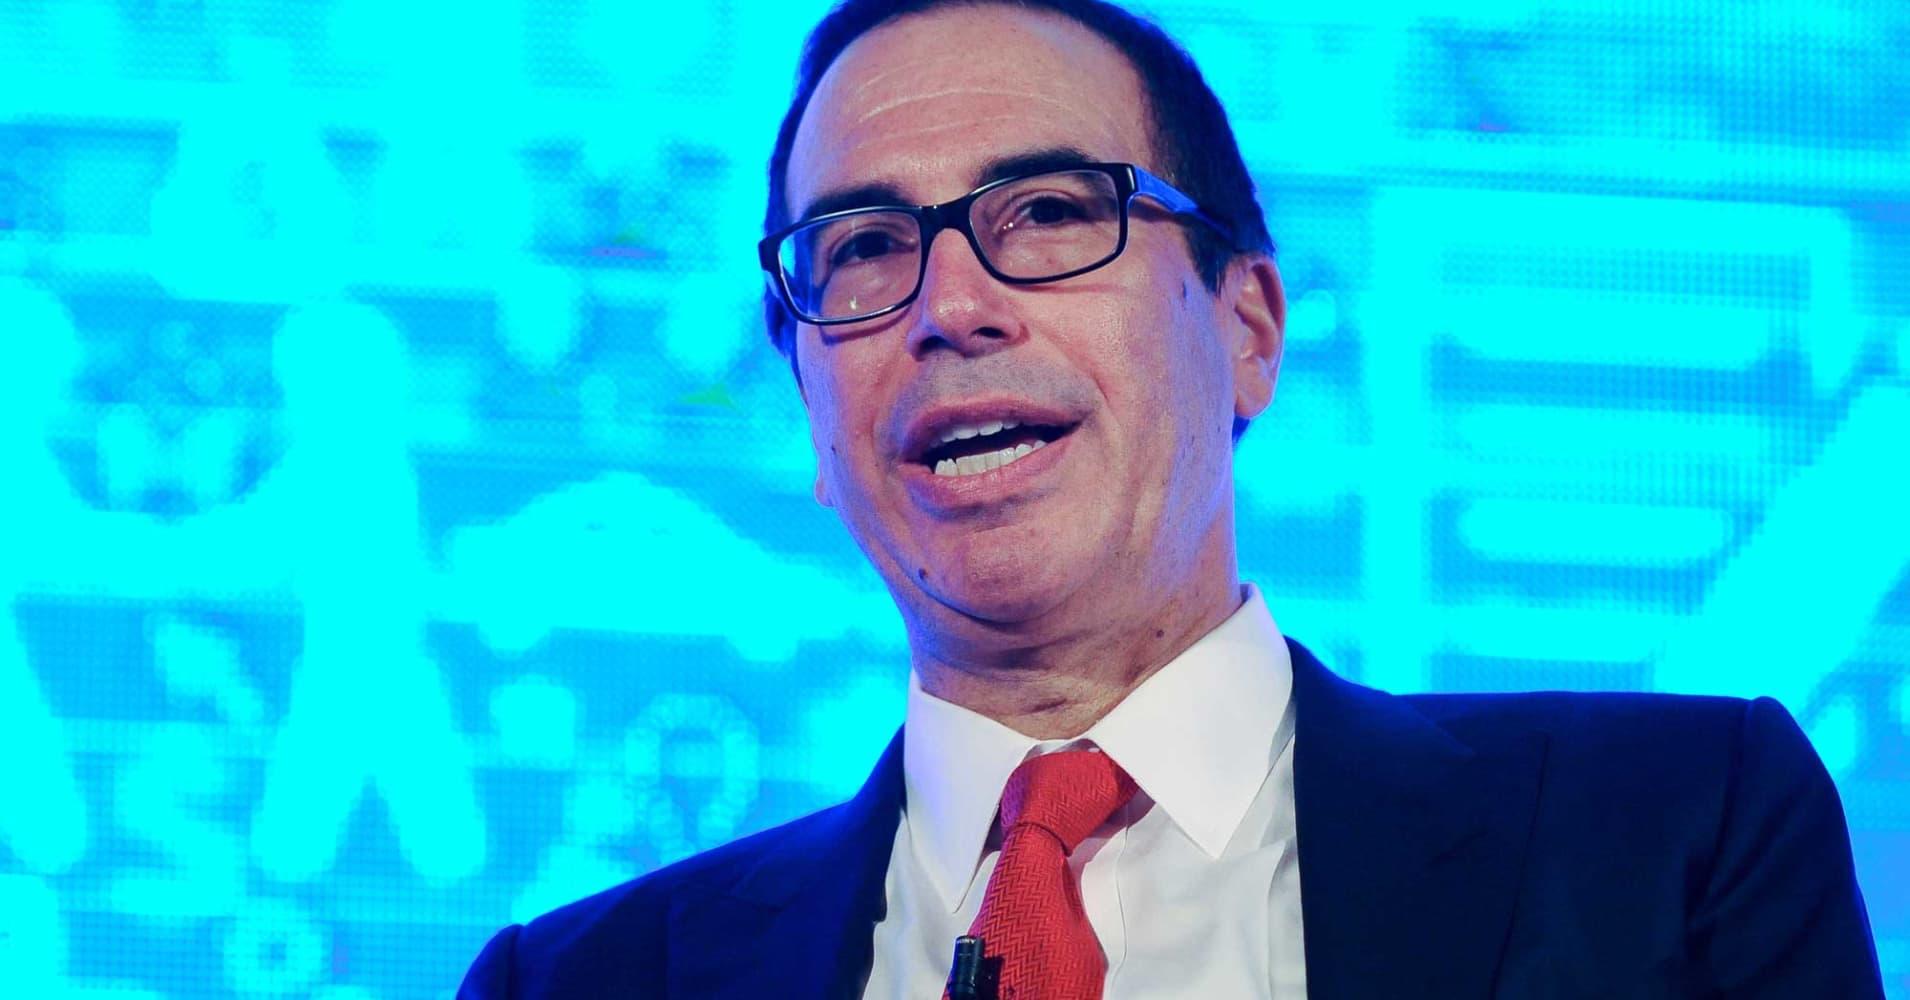 Treasury Secretary Mnuchin backs off pledge of 'no absolute tax cut' for the wealthy